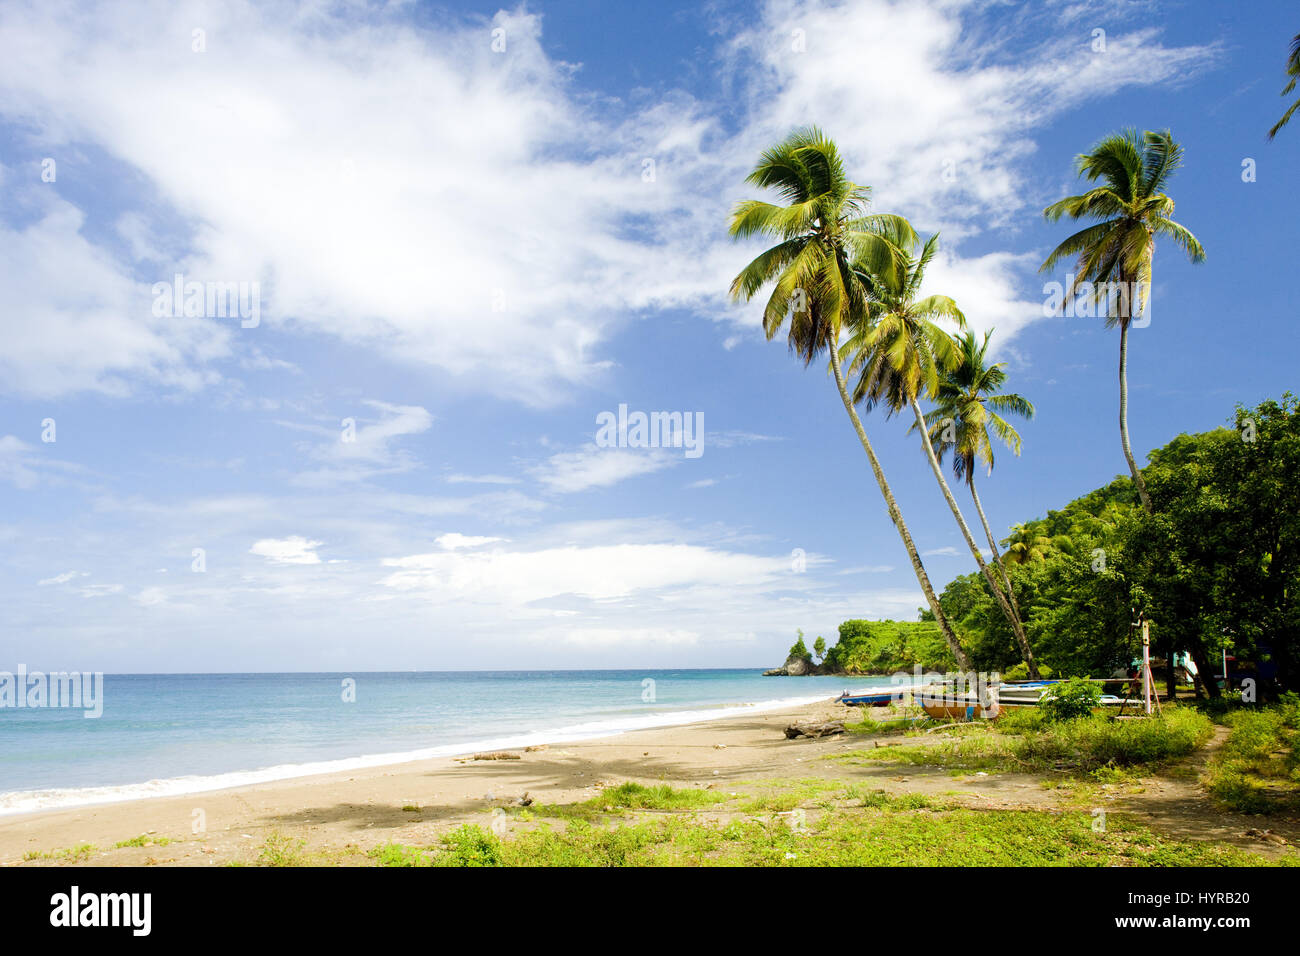 Duquesne Bay, Grenada - Stock Image